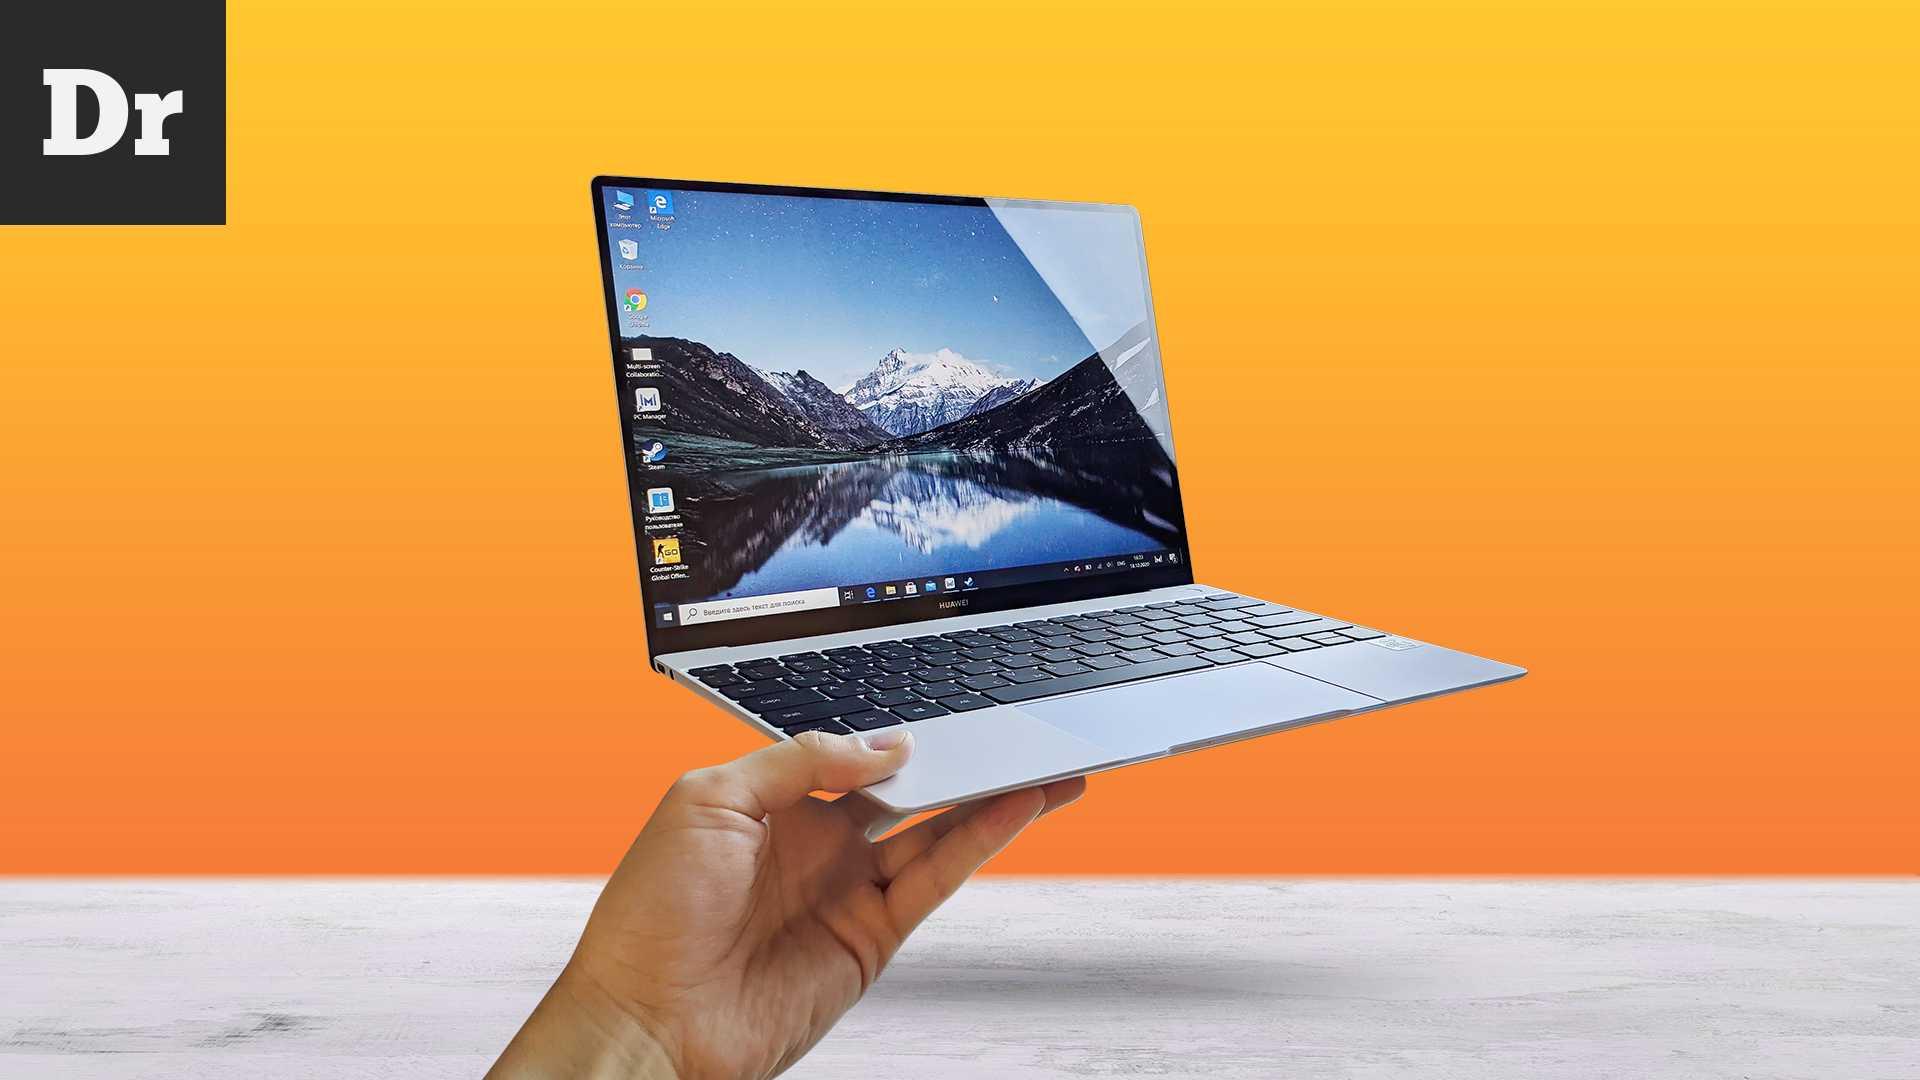 Тест-обзор премиального ноутбука huawei matebook x pro 2020